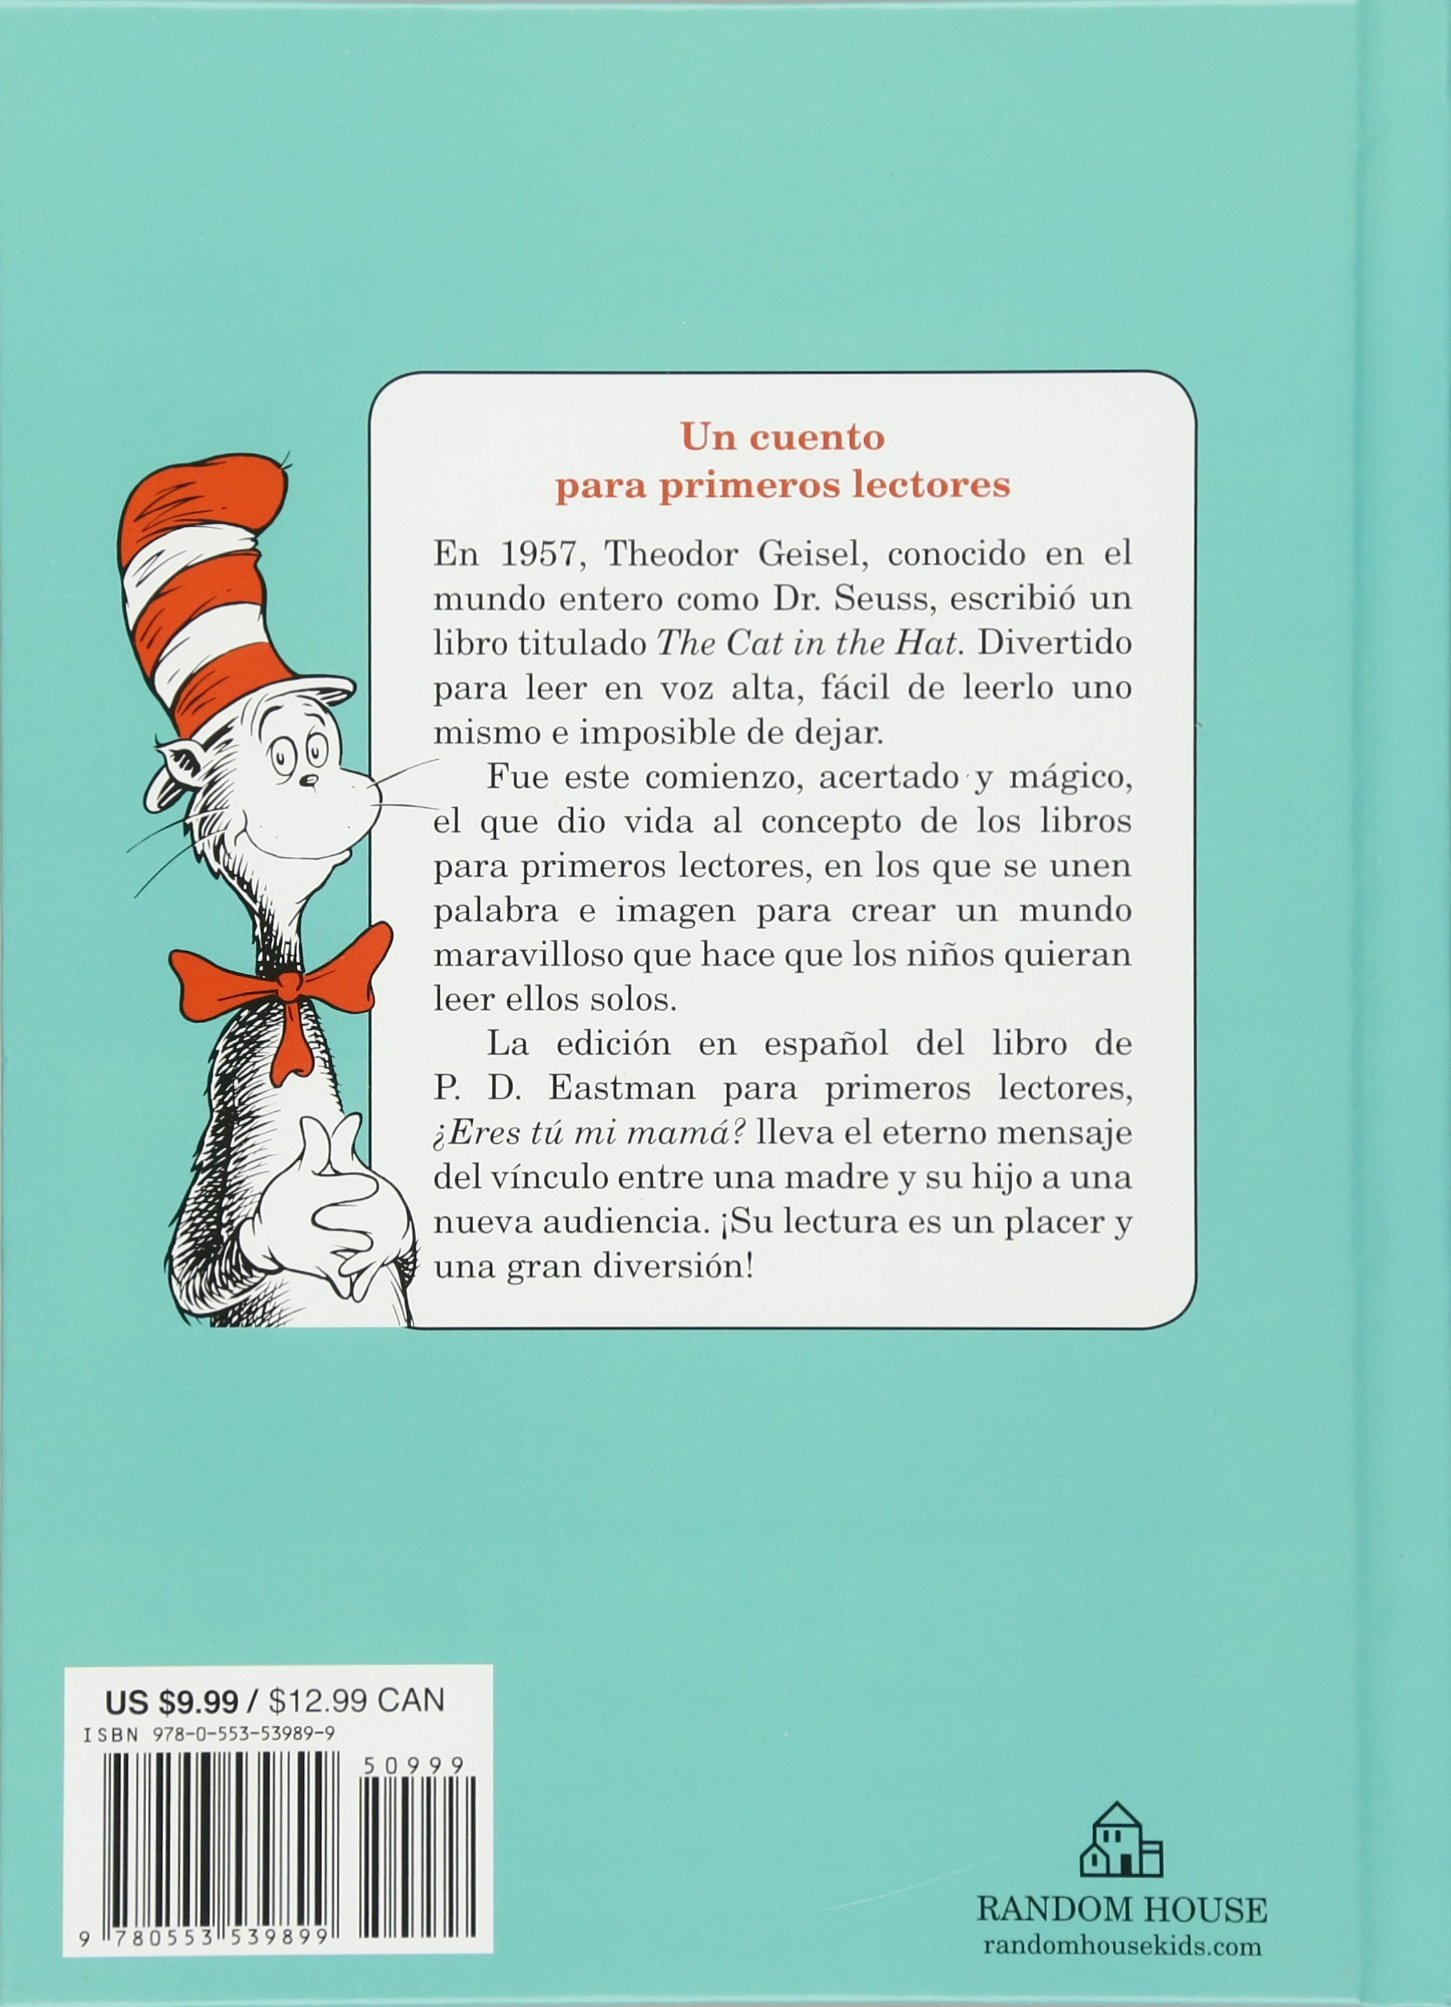 Amazon.com: ¿Eres tú mi mamá? (Are You My Mother? Spanish Edition)  (Beginner Books(R)) (9780553539899): P.D. Eastman: Books